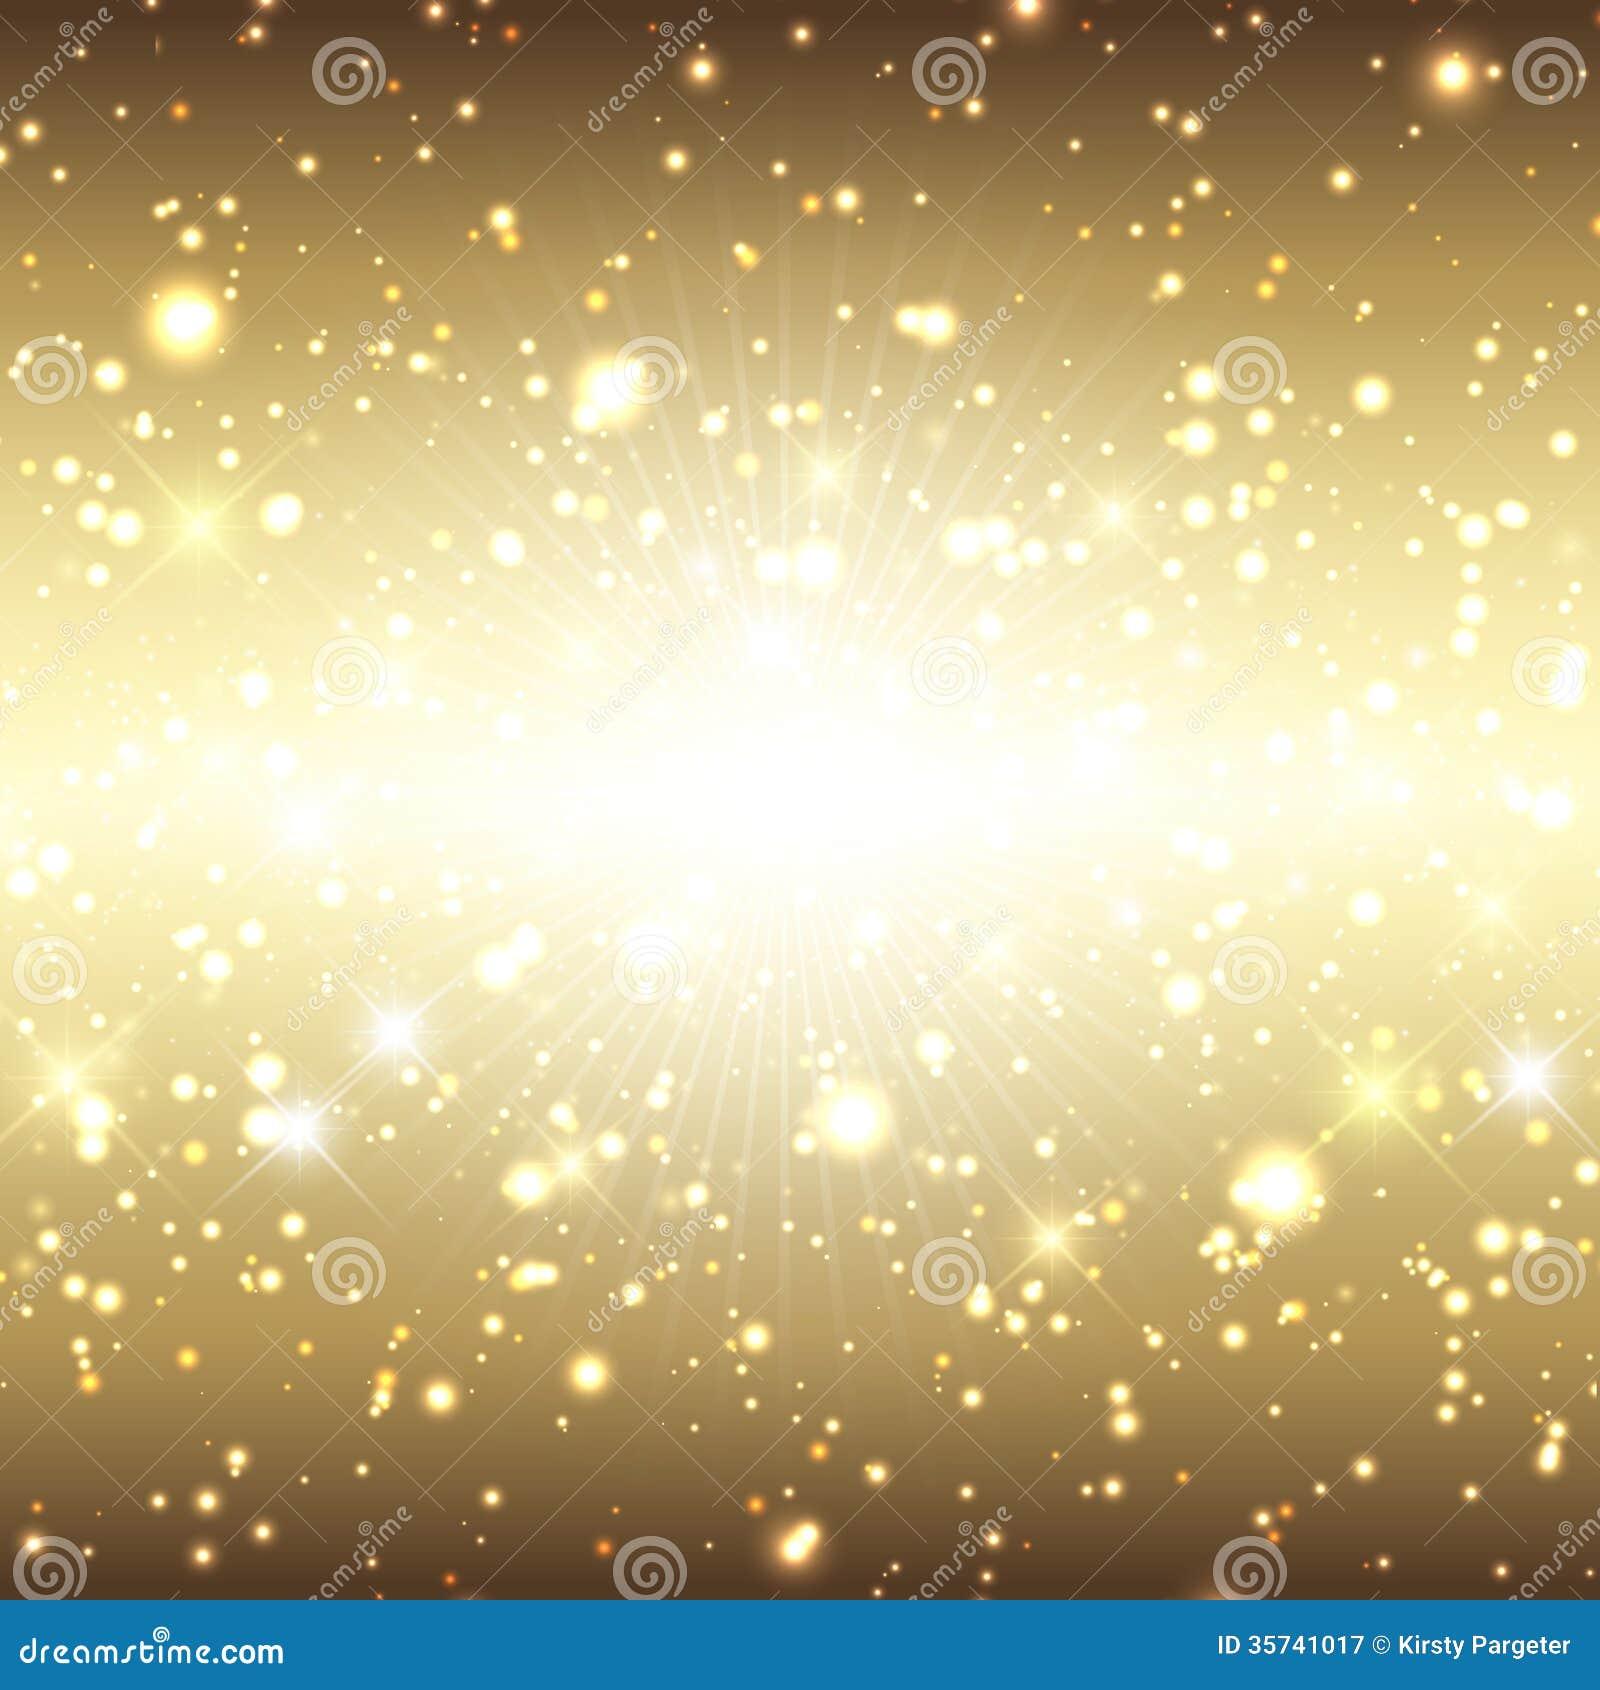 christmas sparkle wallpaper - photo #27